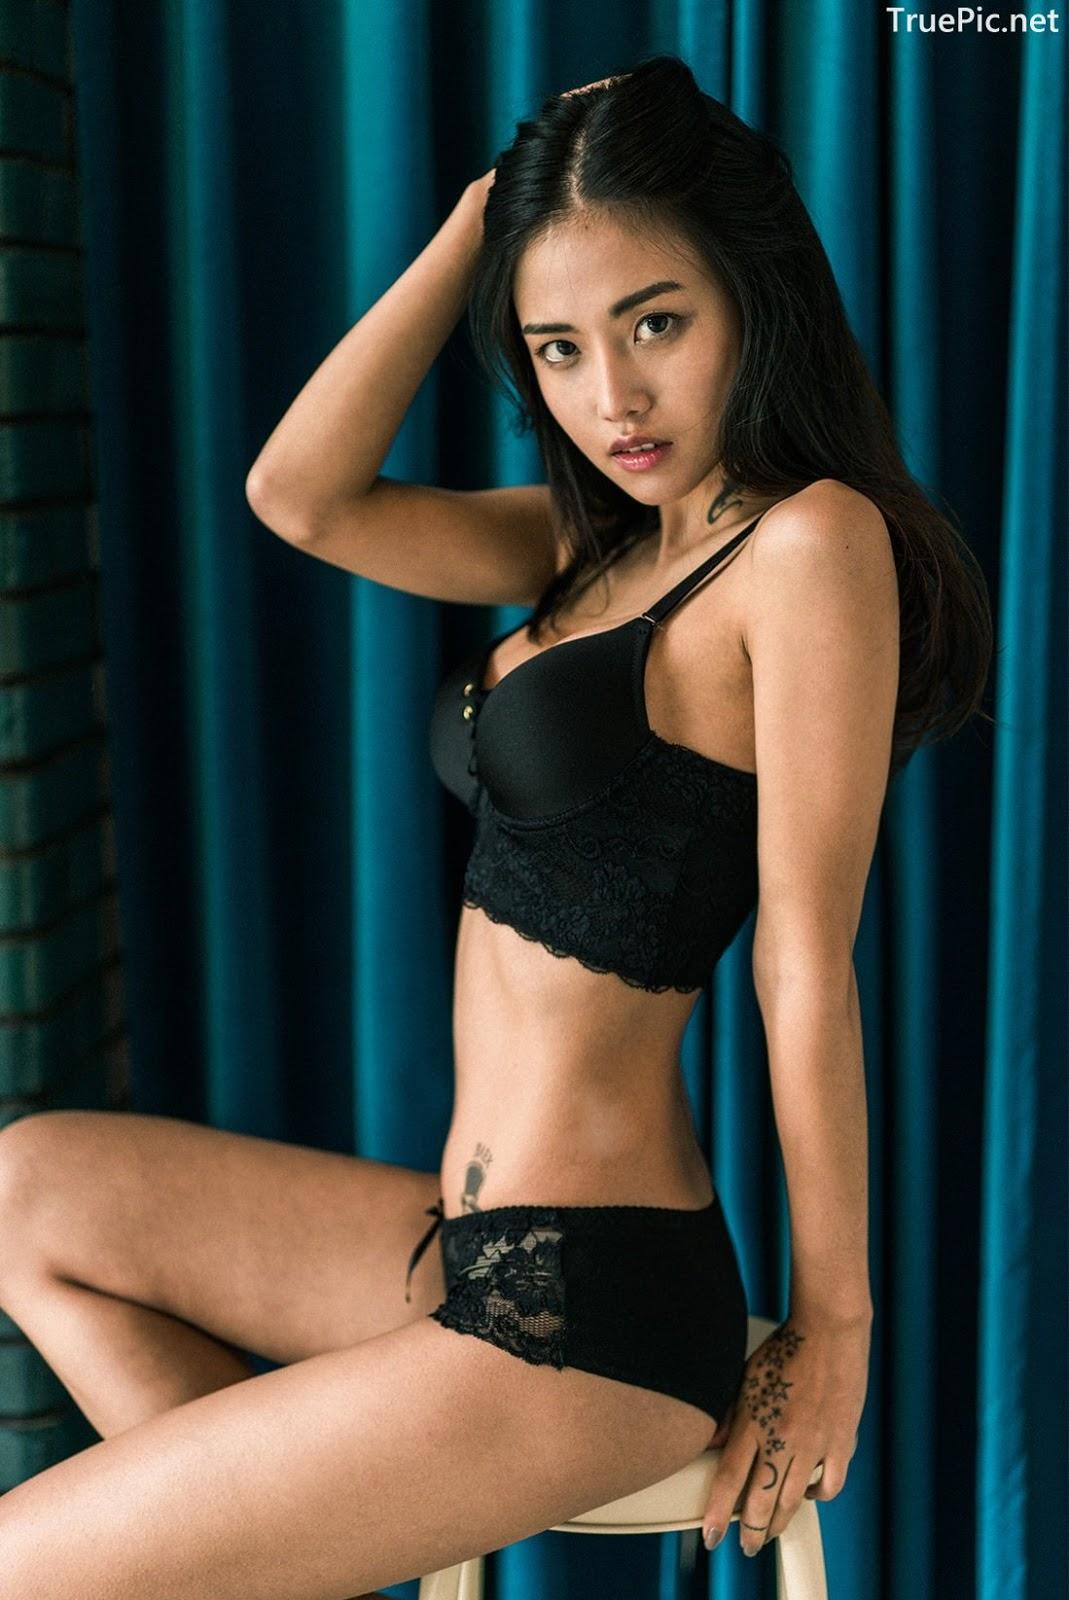 Image-Korean-Fashion-Model–Baek-Ye-Jin–Sexy-Lingerie-Collection-2-TruePic.net- Picture-4